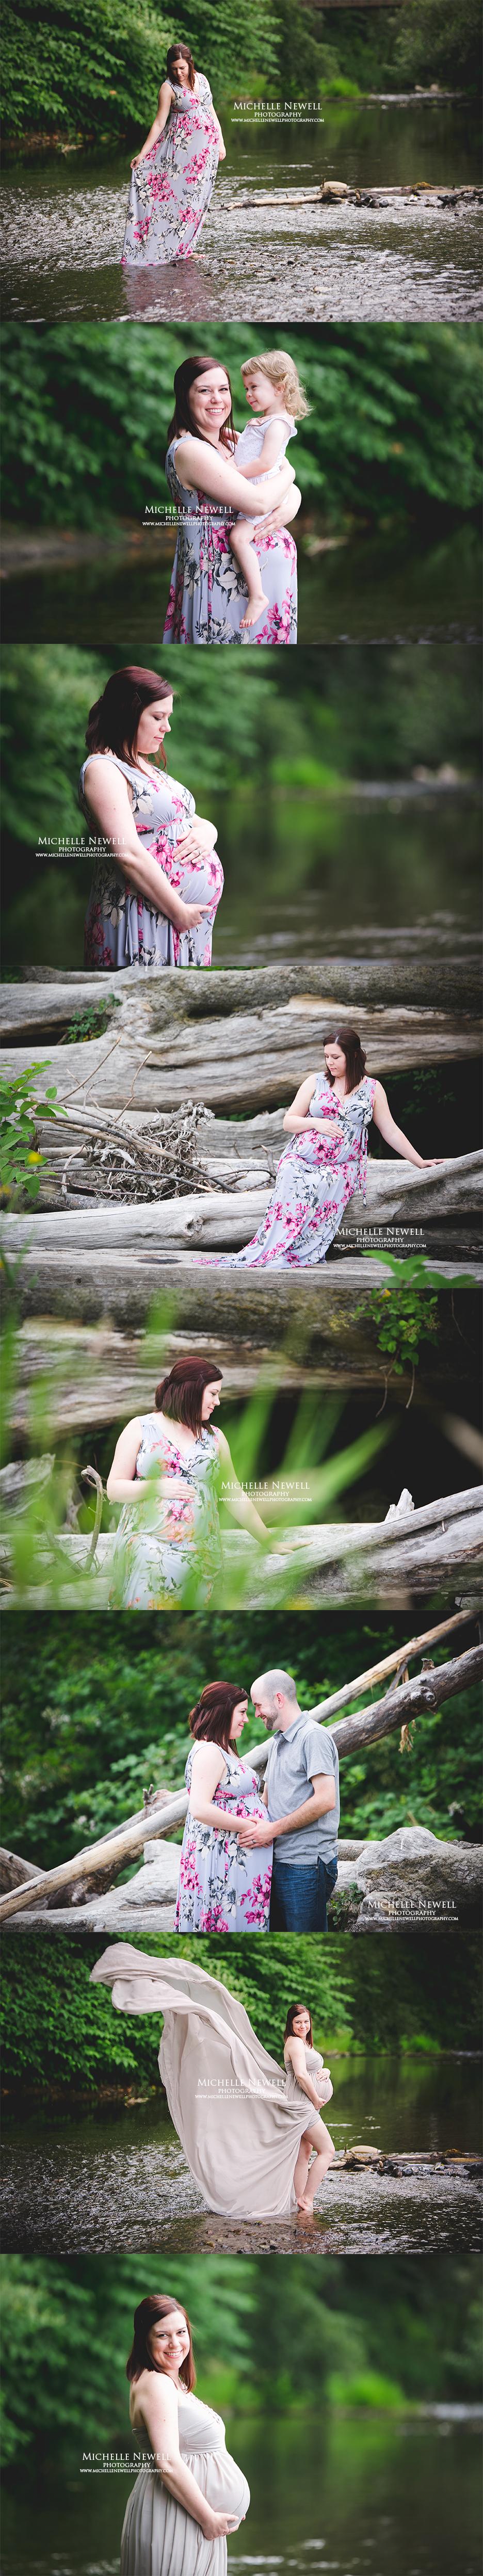 Snohomish WA Maternity Photography